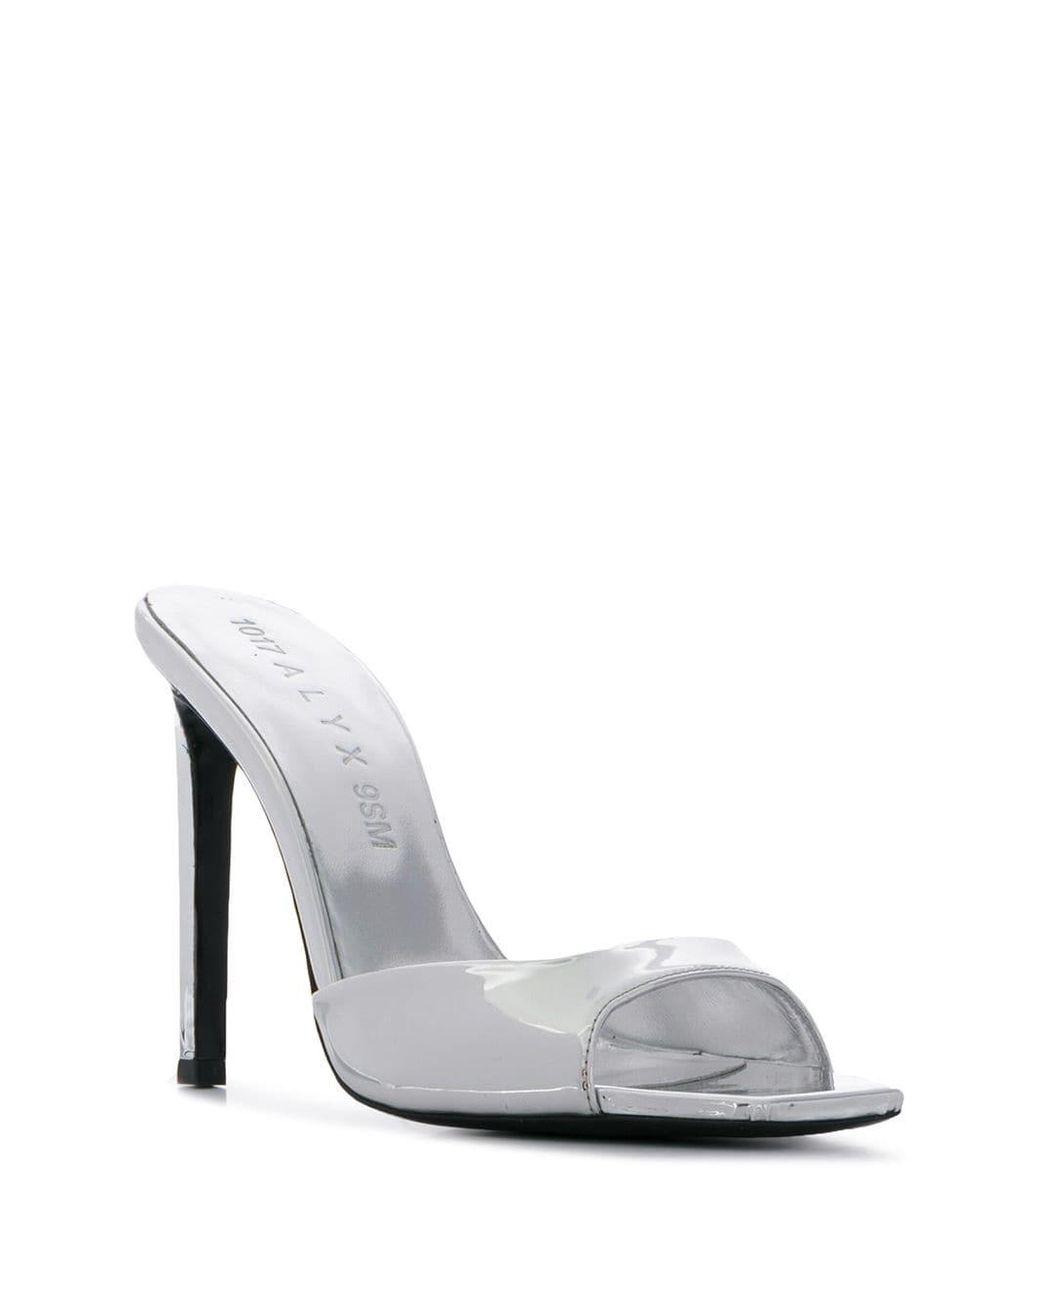 1017 Pn0wok 9sm Lyst Sandals Metallic Black High In Alyx SGzMpUqV